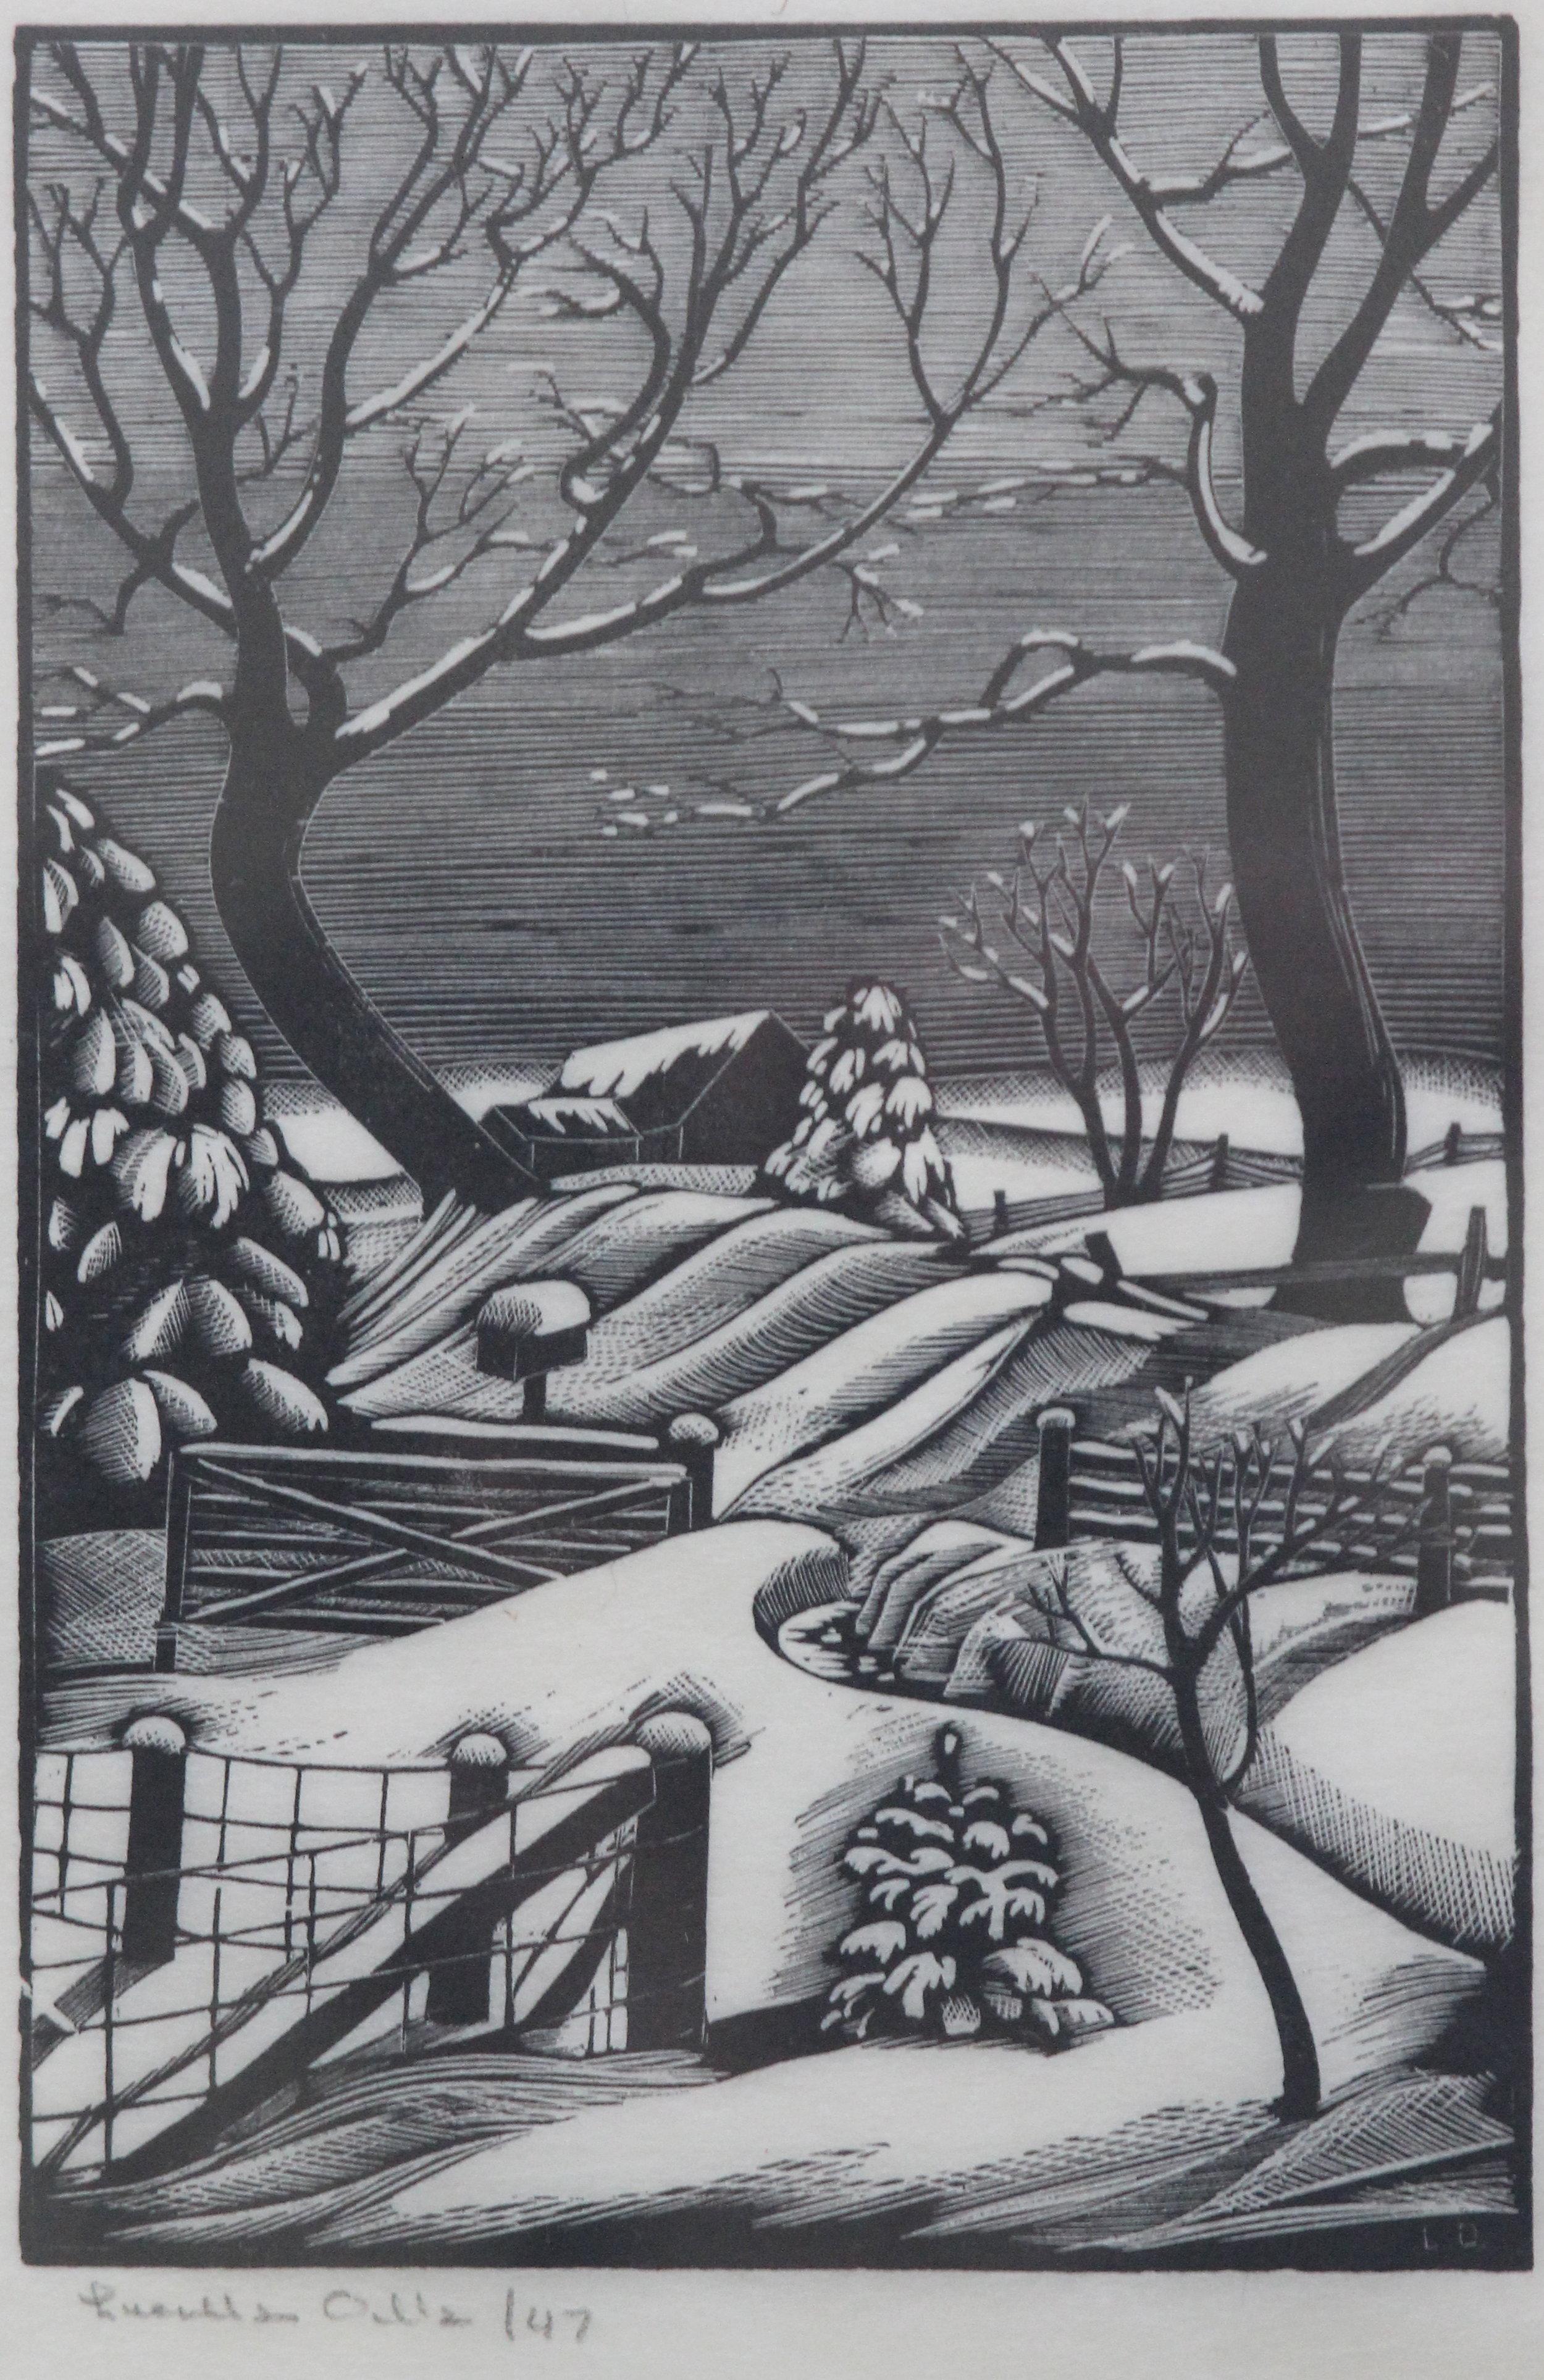 Lucille Oille, Winterscape, 1947